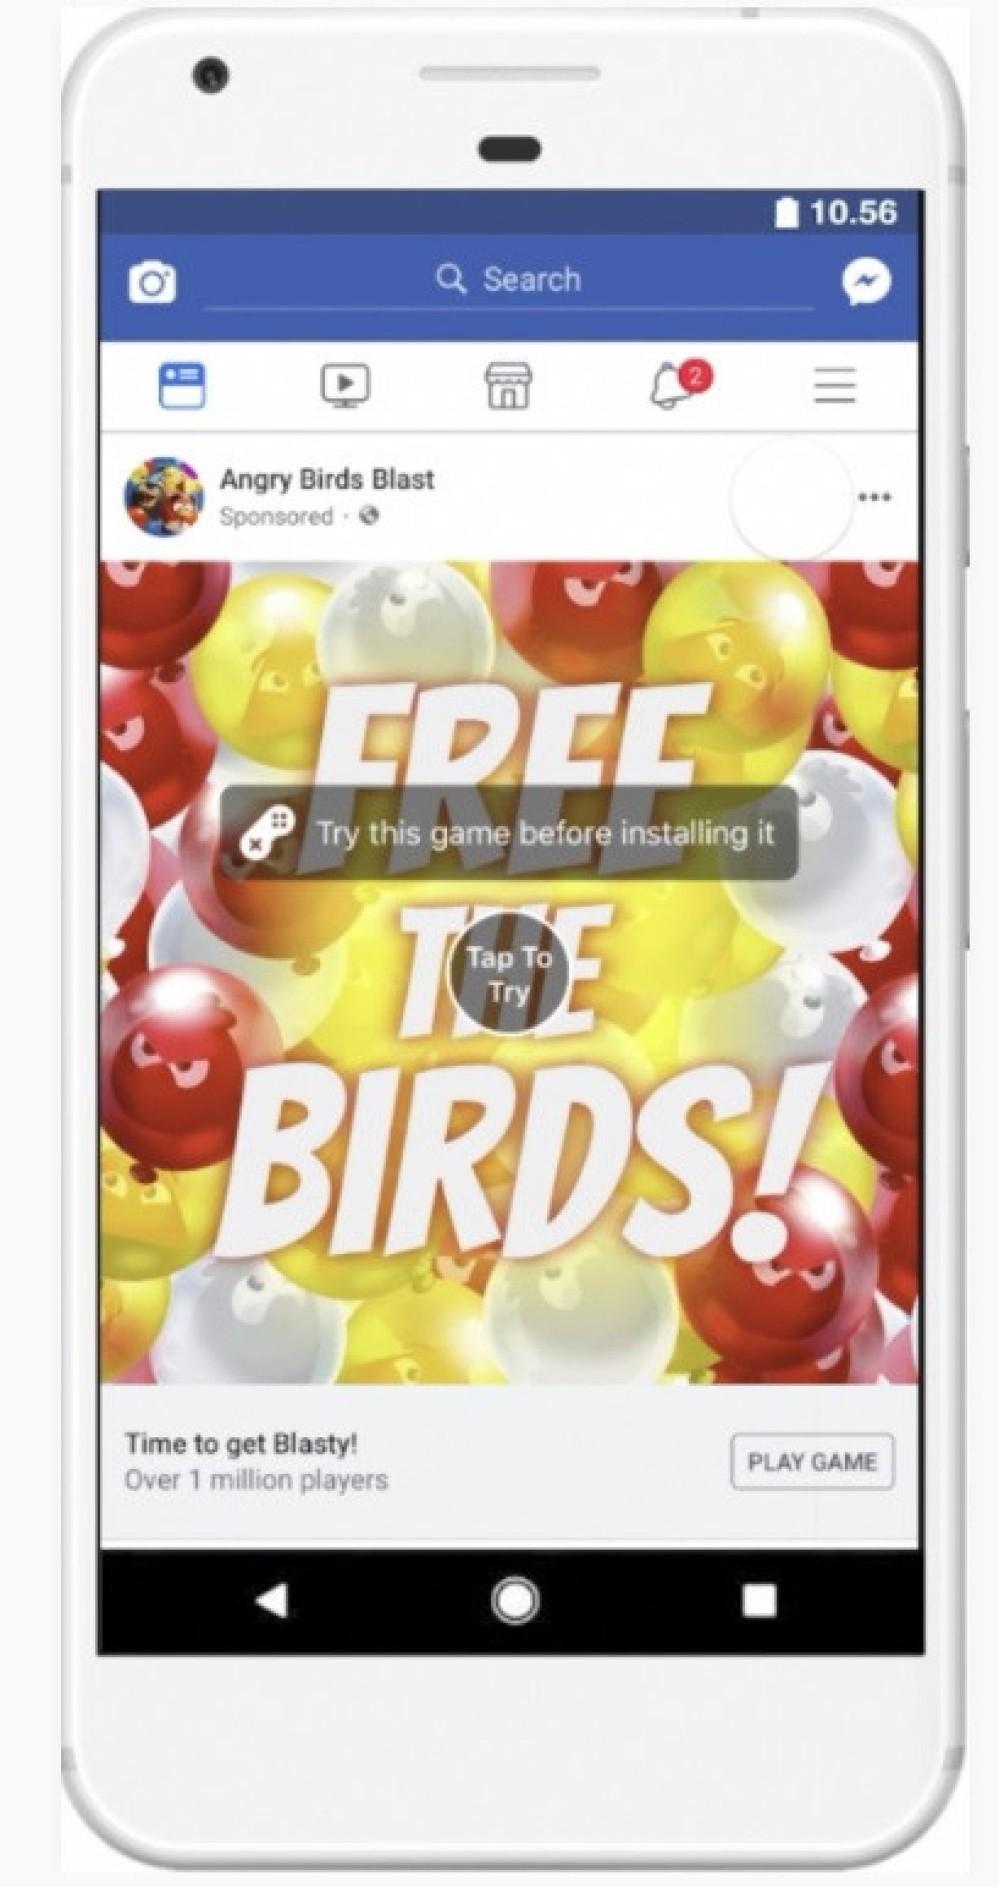 Facebook Playable Ads: Εμφανίστηκαν οι διαδραστικές διαφημίσεις και στο κοινωνικό δίκτυο